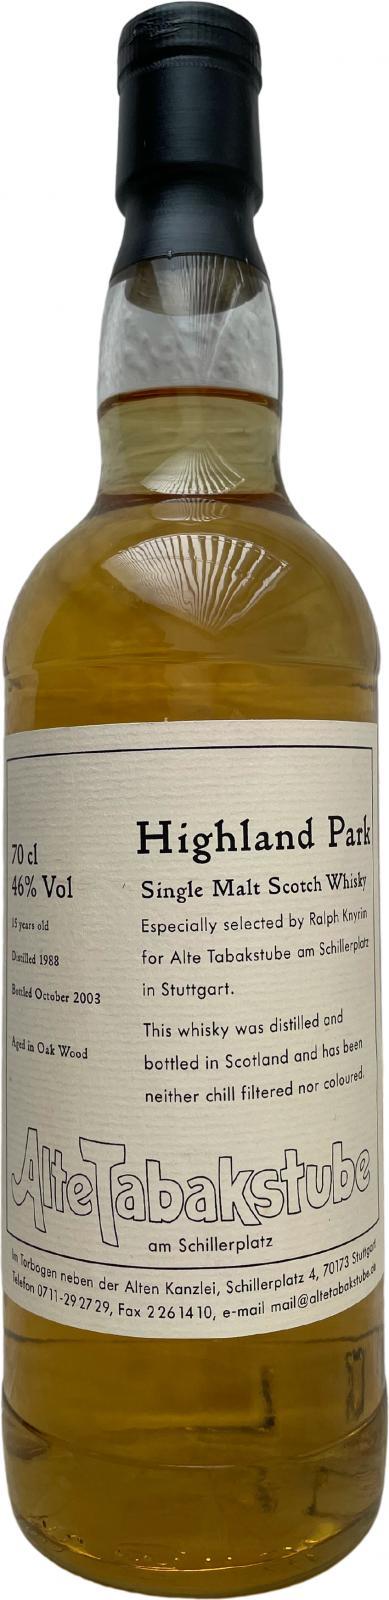 Highland Park 1988 AT